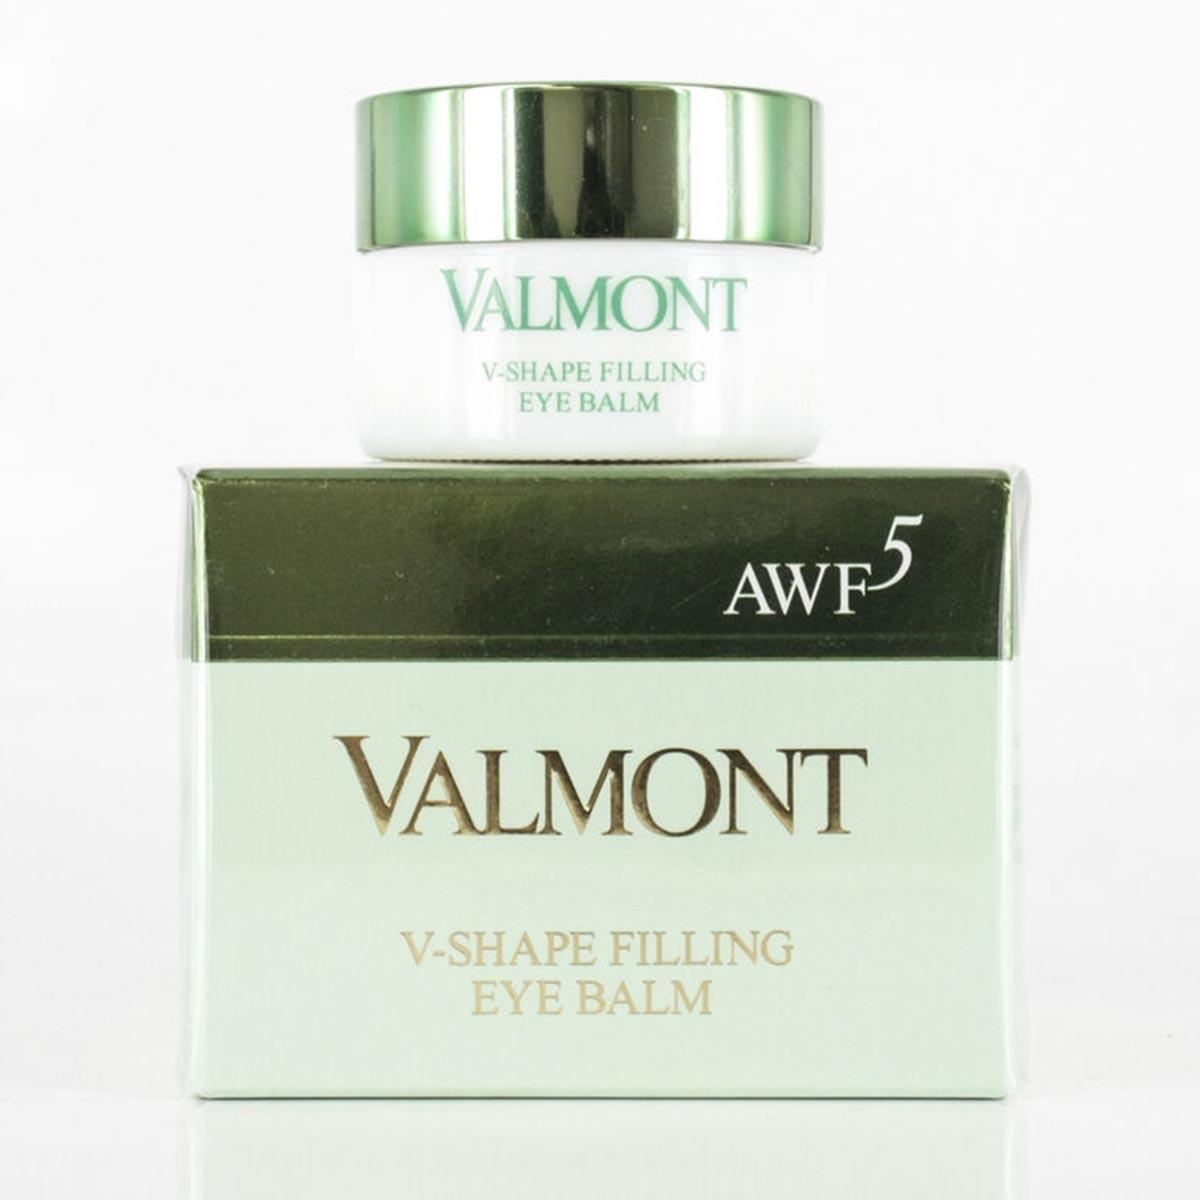 Valmont awf5 v shape filling eye balm 15ml